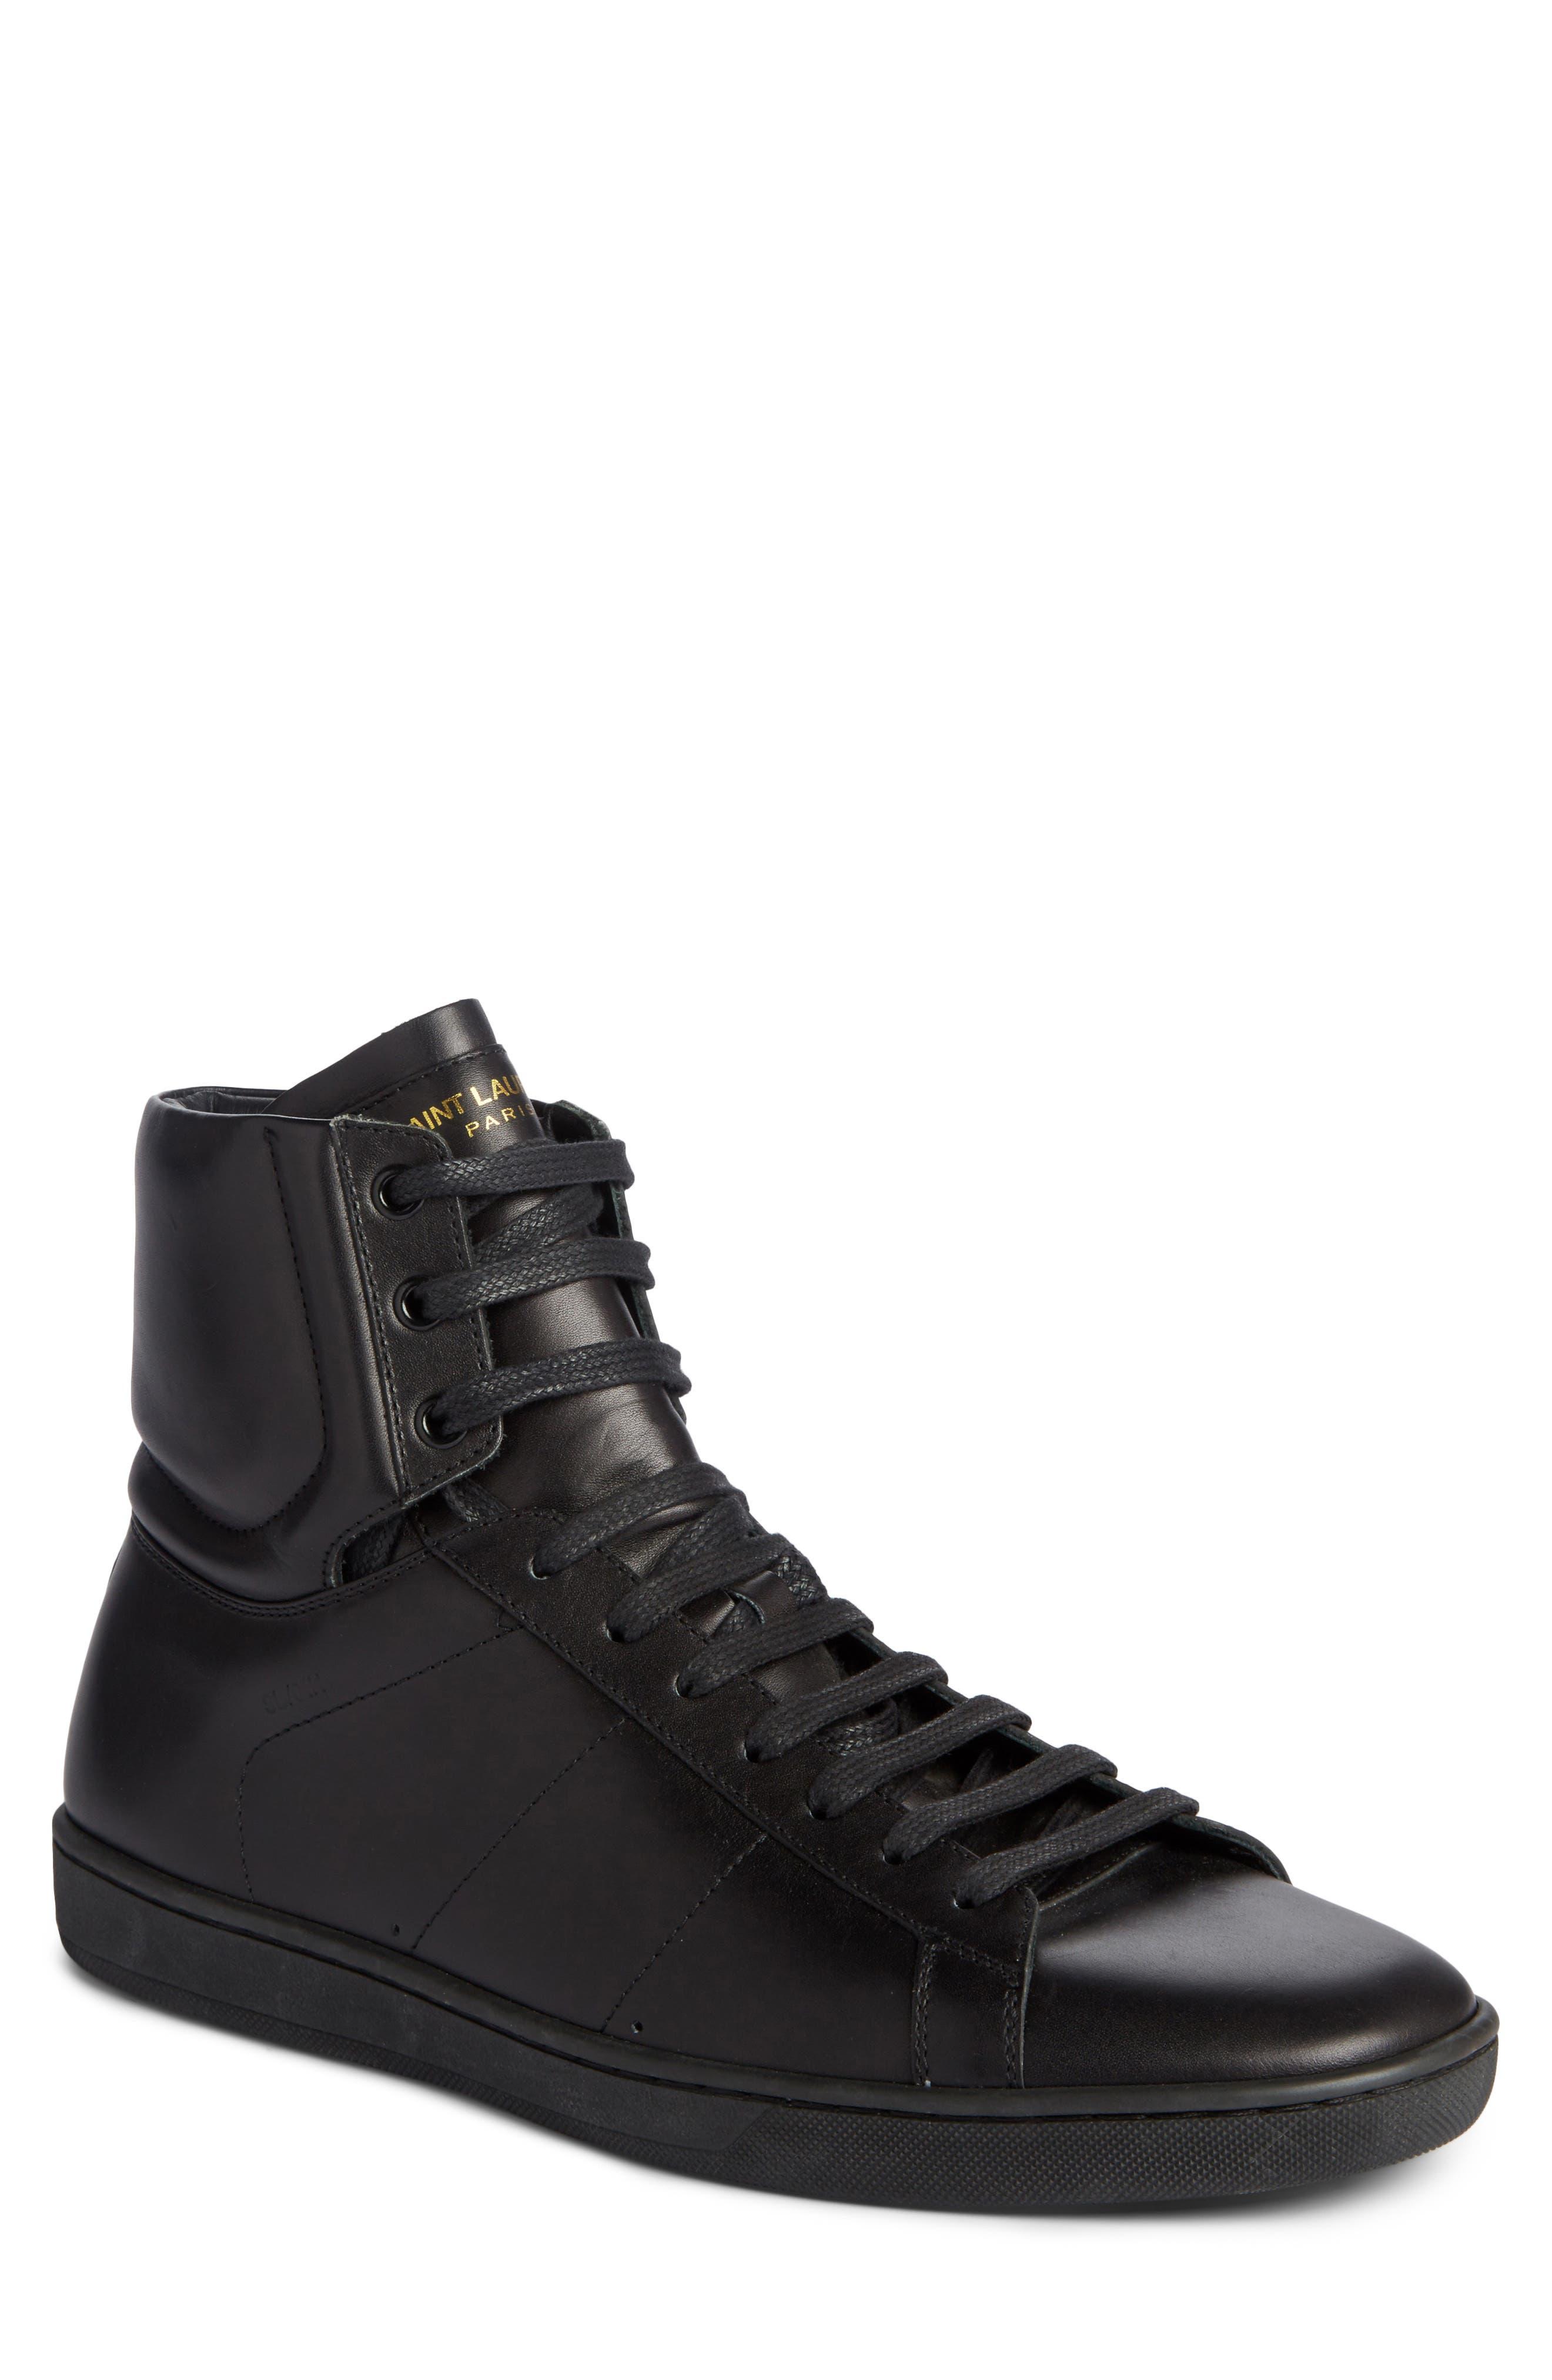 Alternate Image 1 Selected - Saint Laurent Signature Court Classic Sneaker (Men)